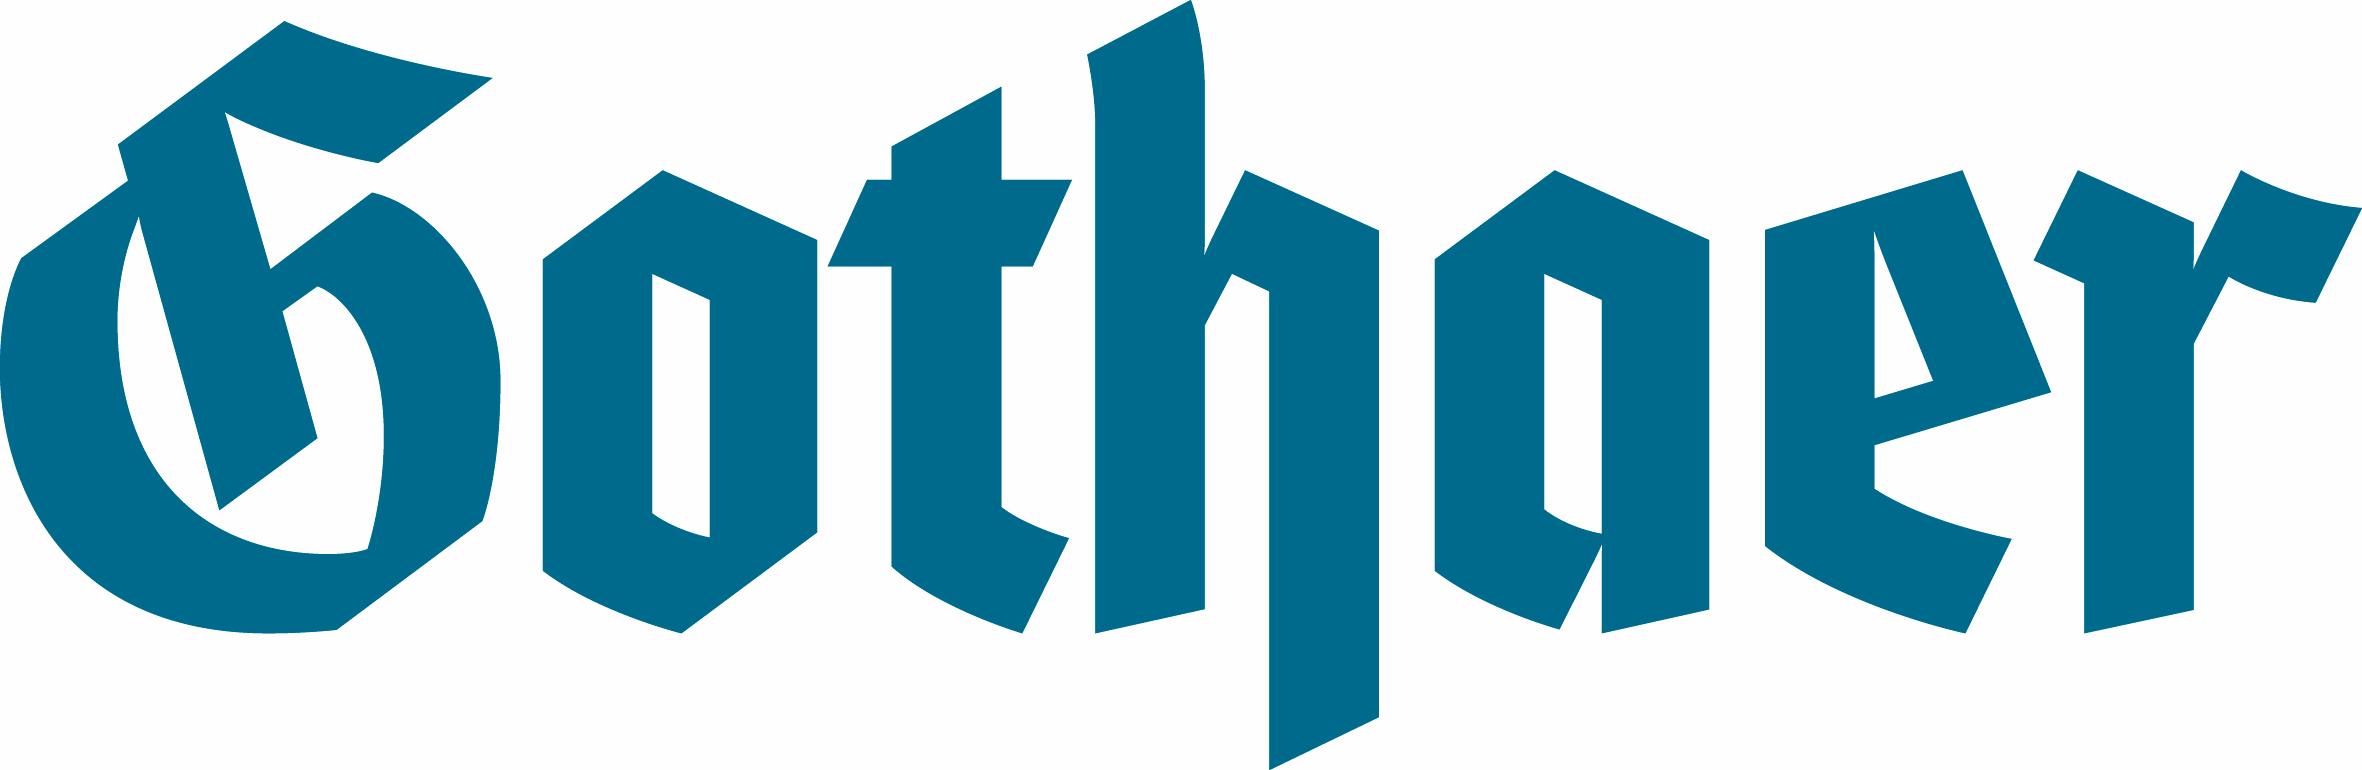 Gothaer Health Insurance